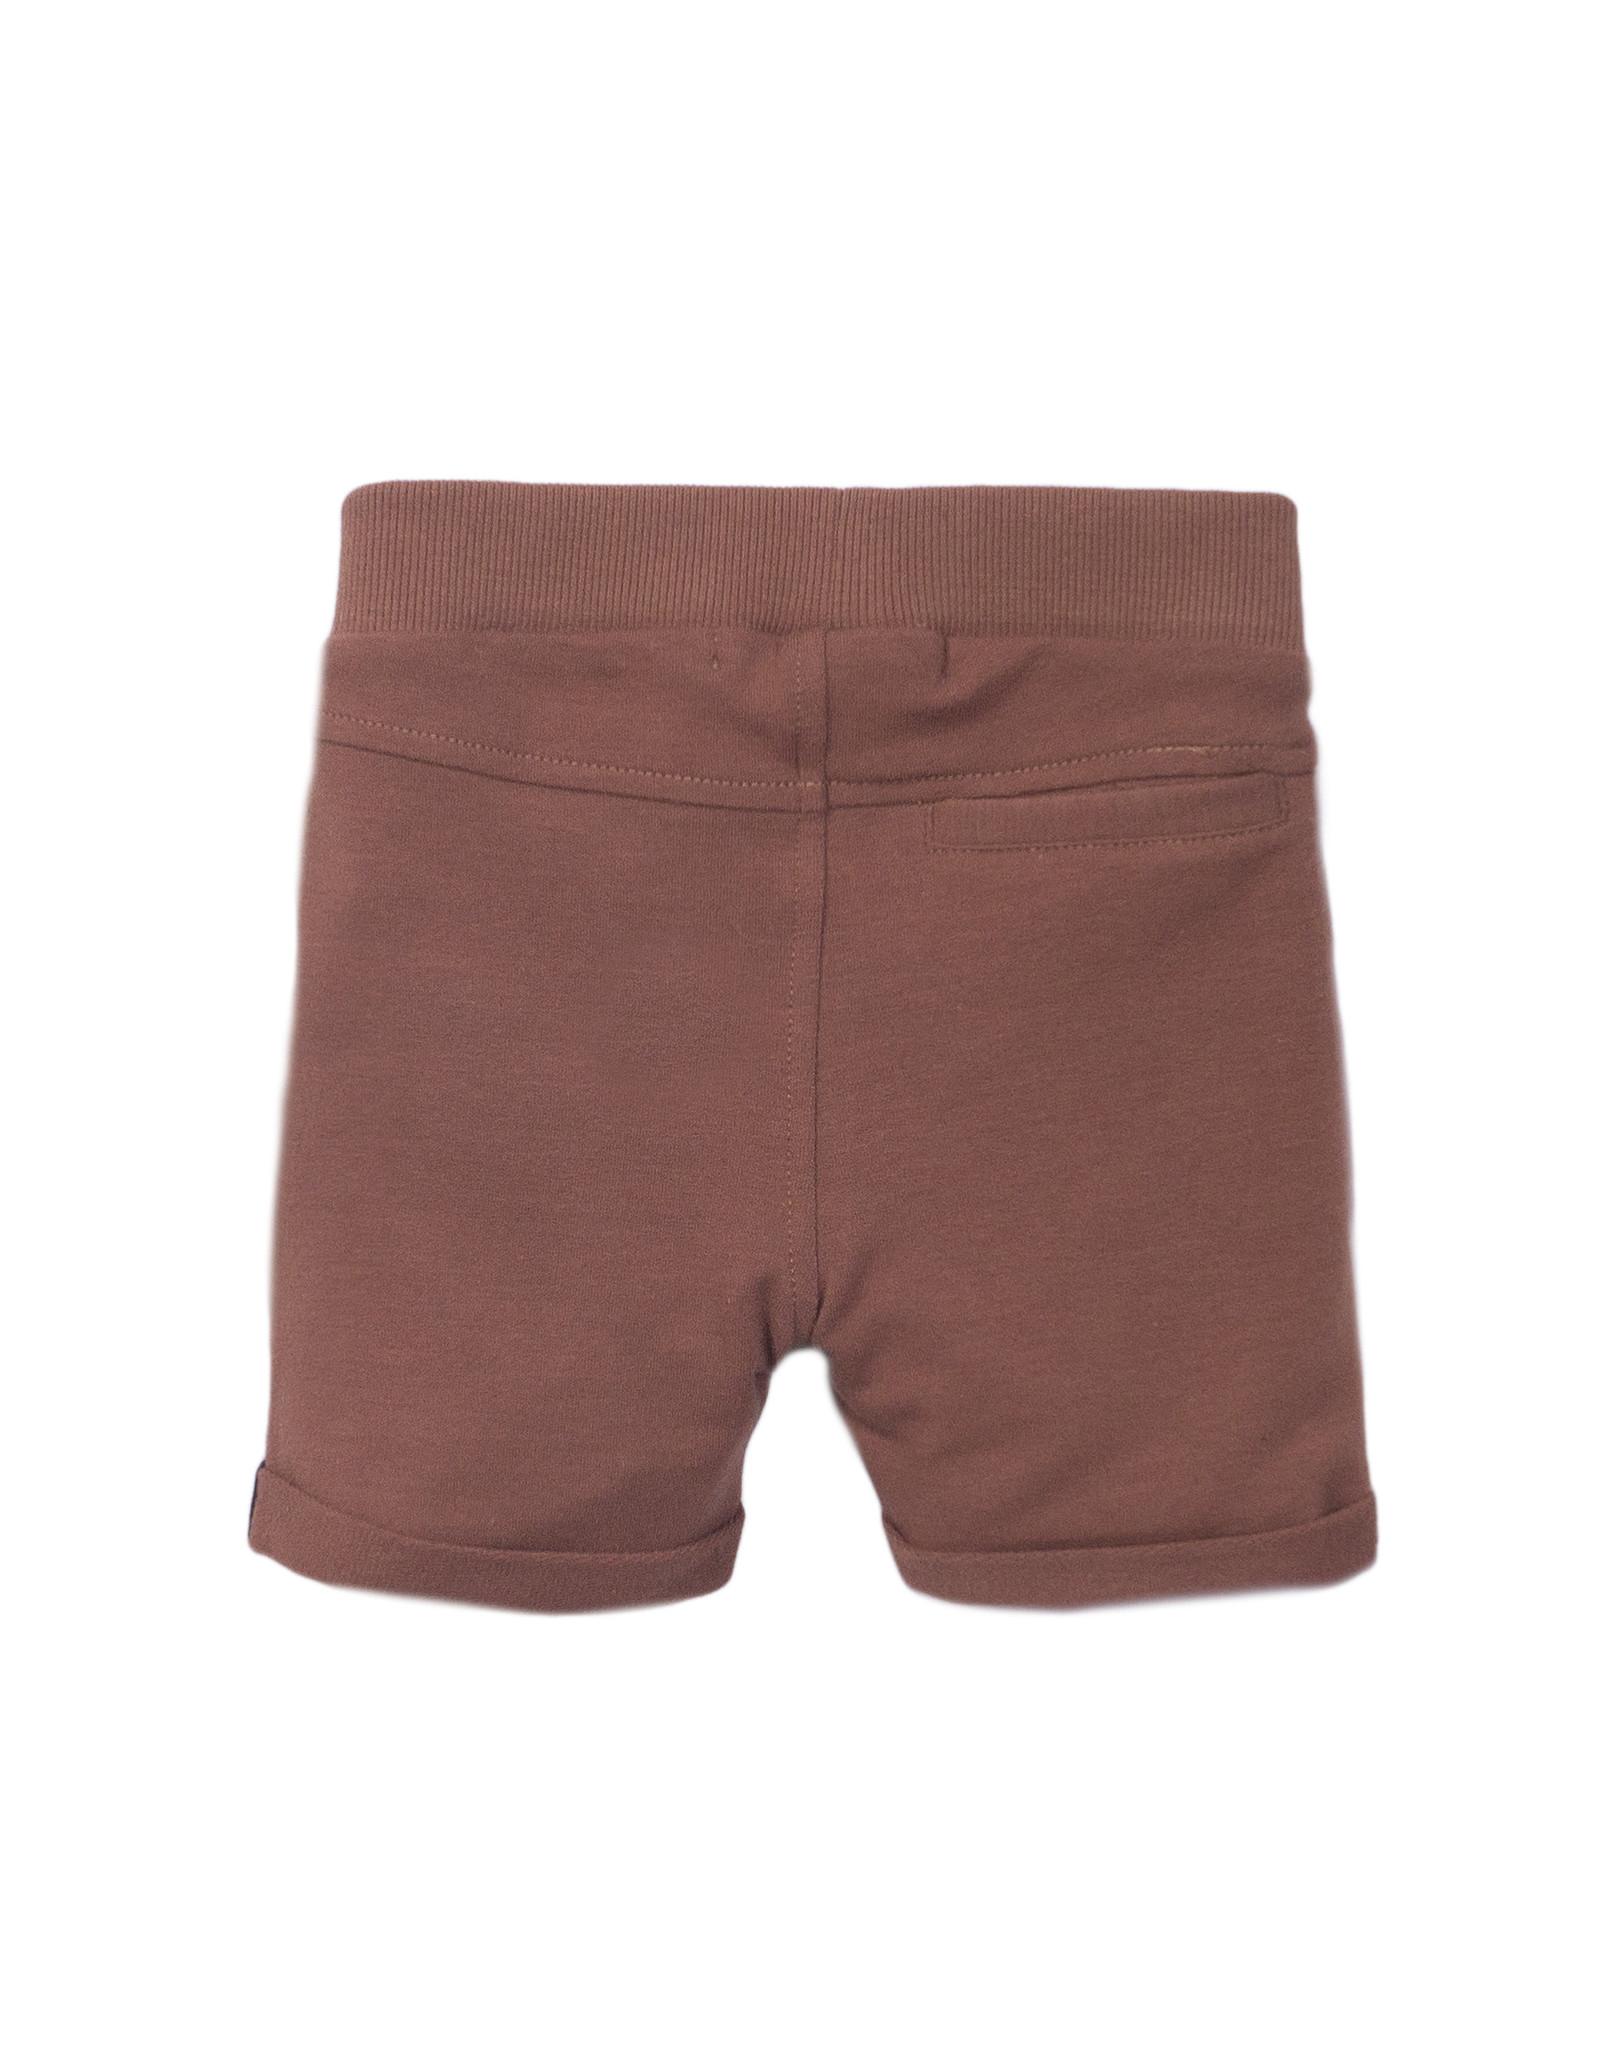 Koko Noko Boys Jogging shorts Camel